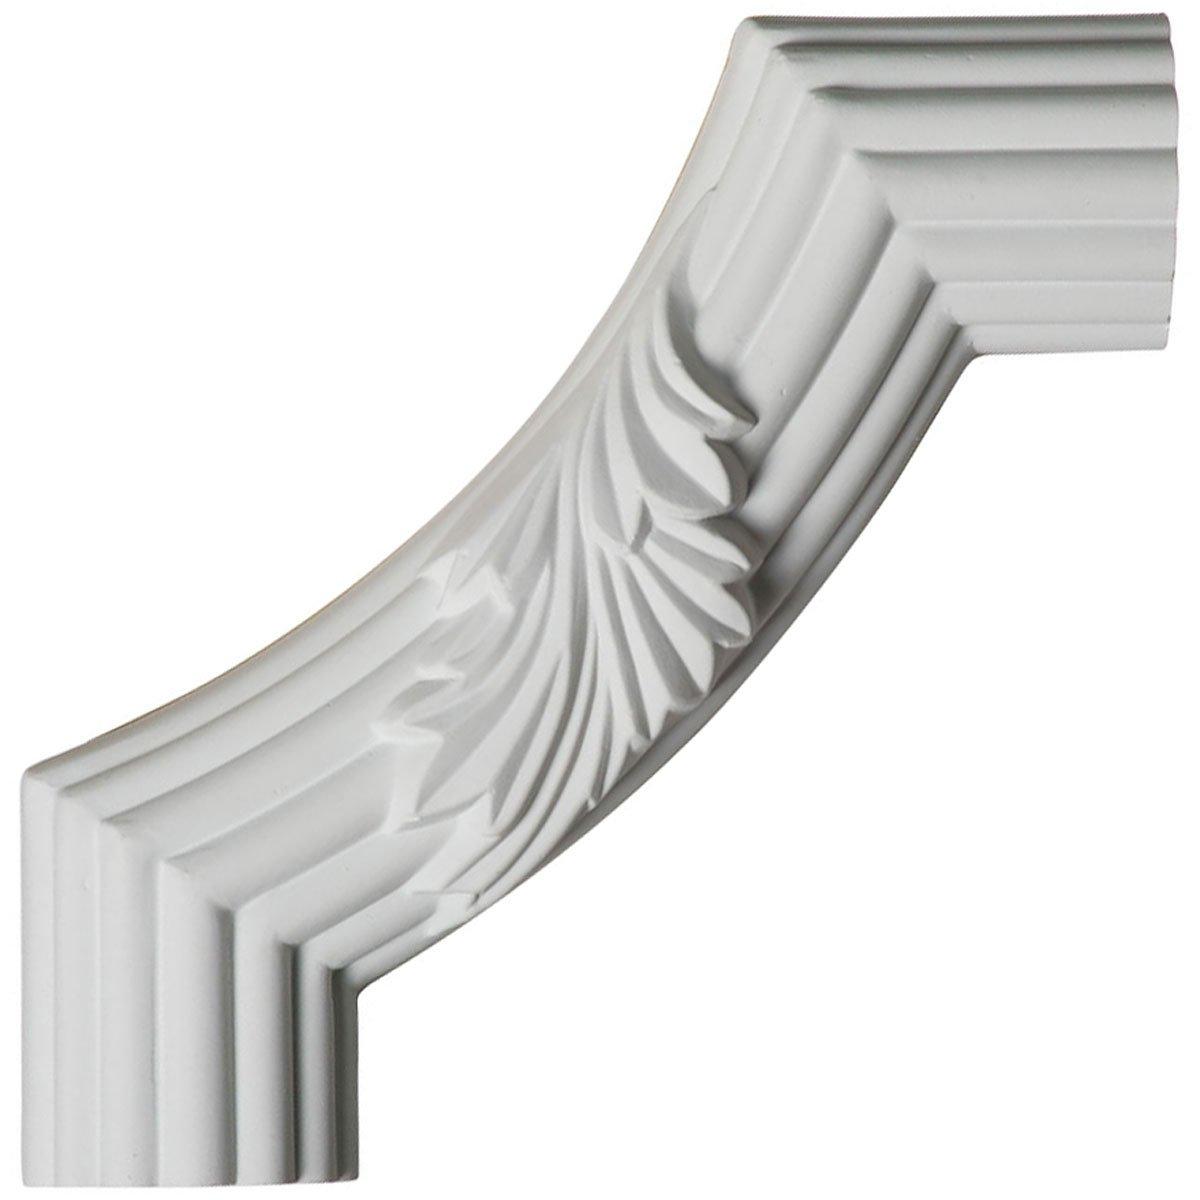 , Ekena Millwork PML28X28LO-CASE-4 28 inch W x 28 inch H x 3//4 inch P Loera Panel Moulding Corner 4-Pack